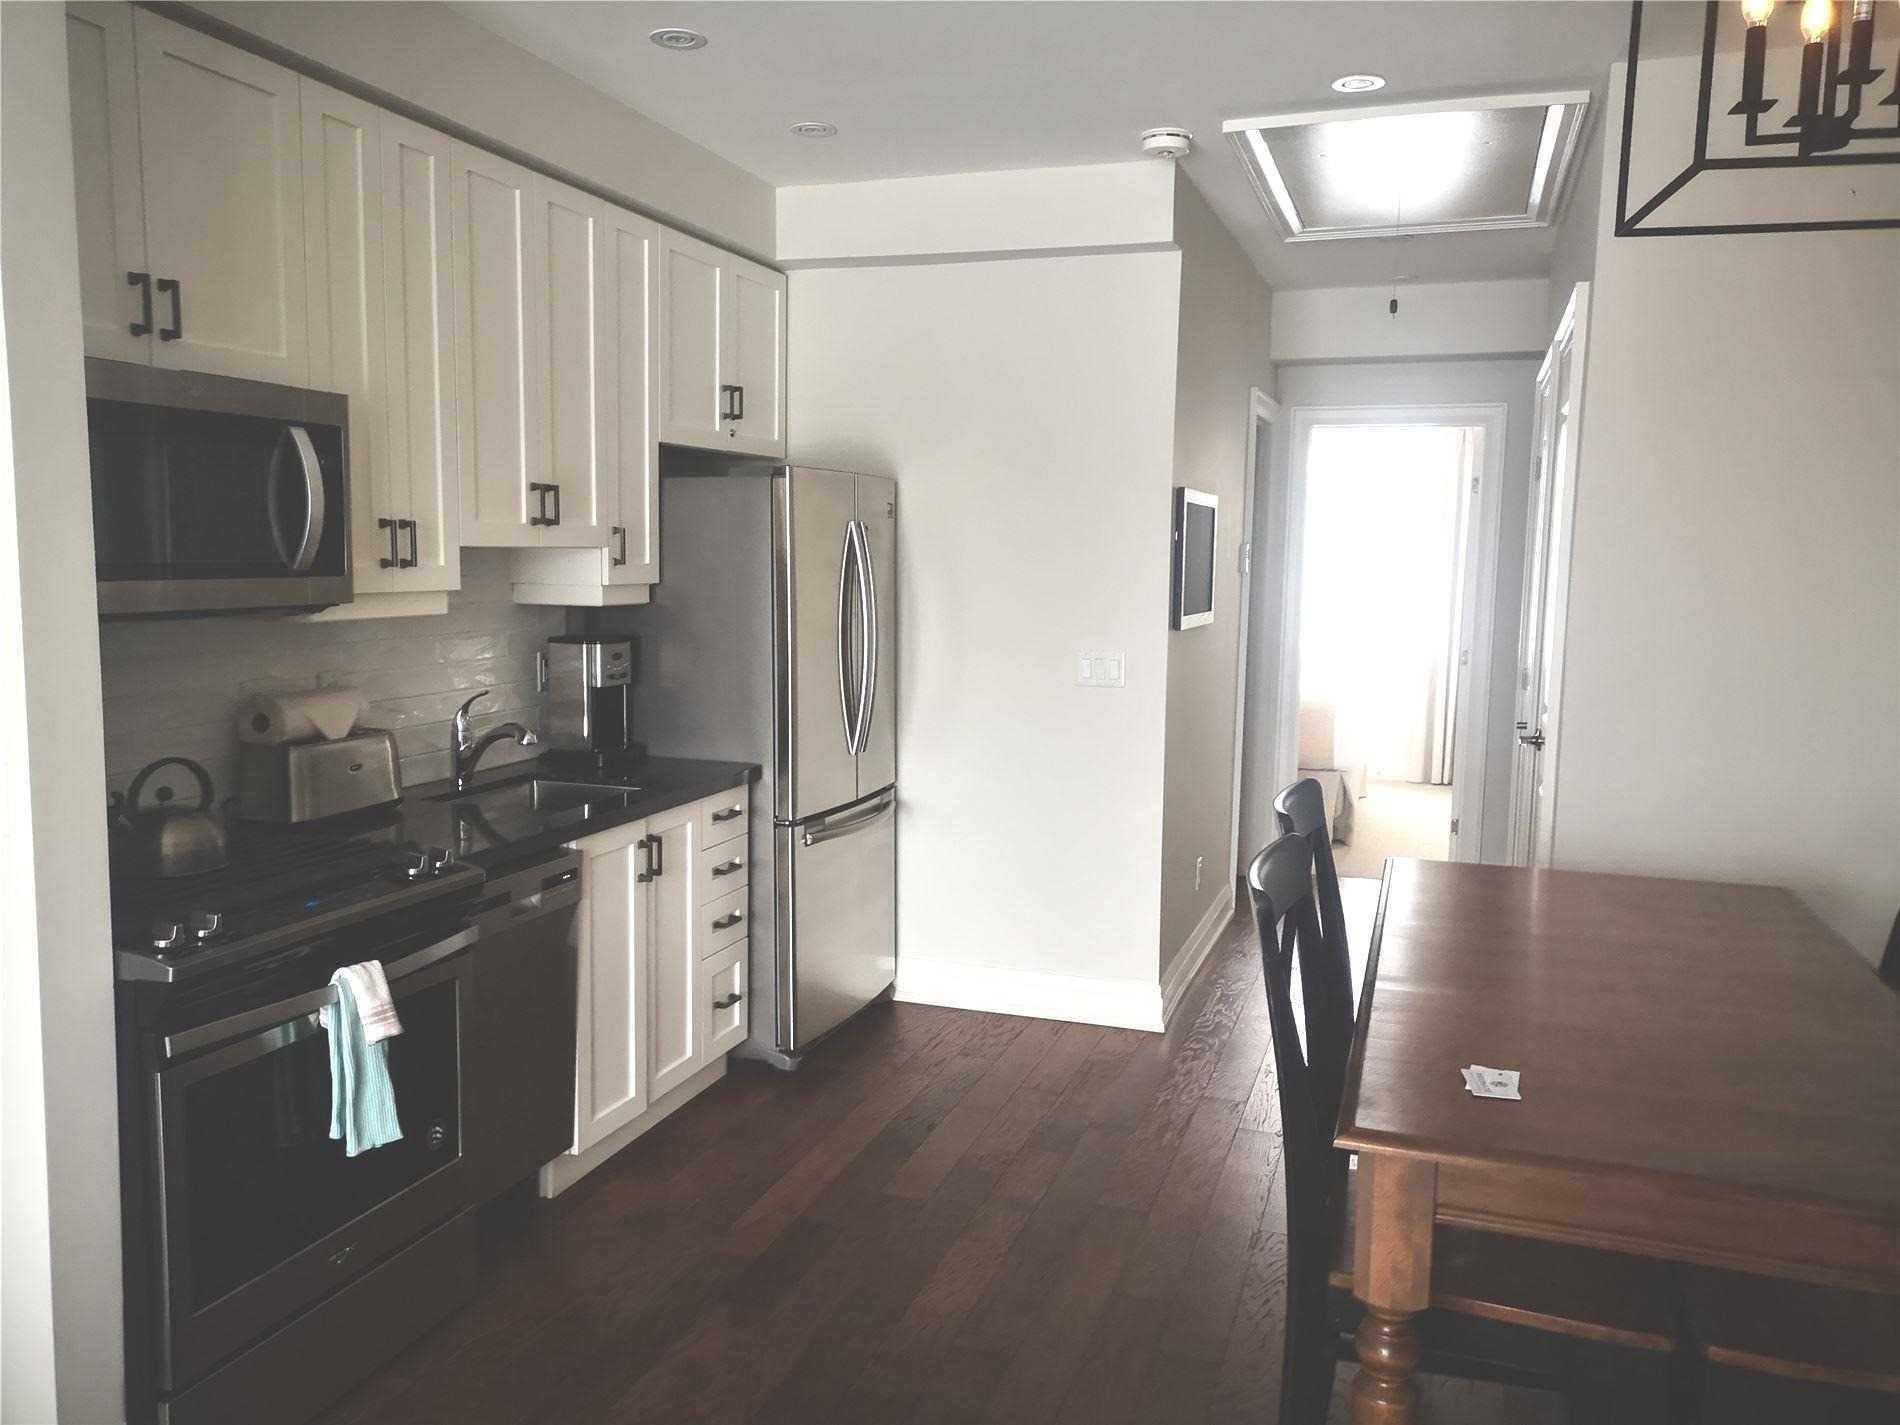 1869 Muskoka Rd 118 Rd W, Bracebridge, Ontario (ID X5341011)